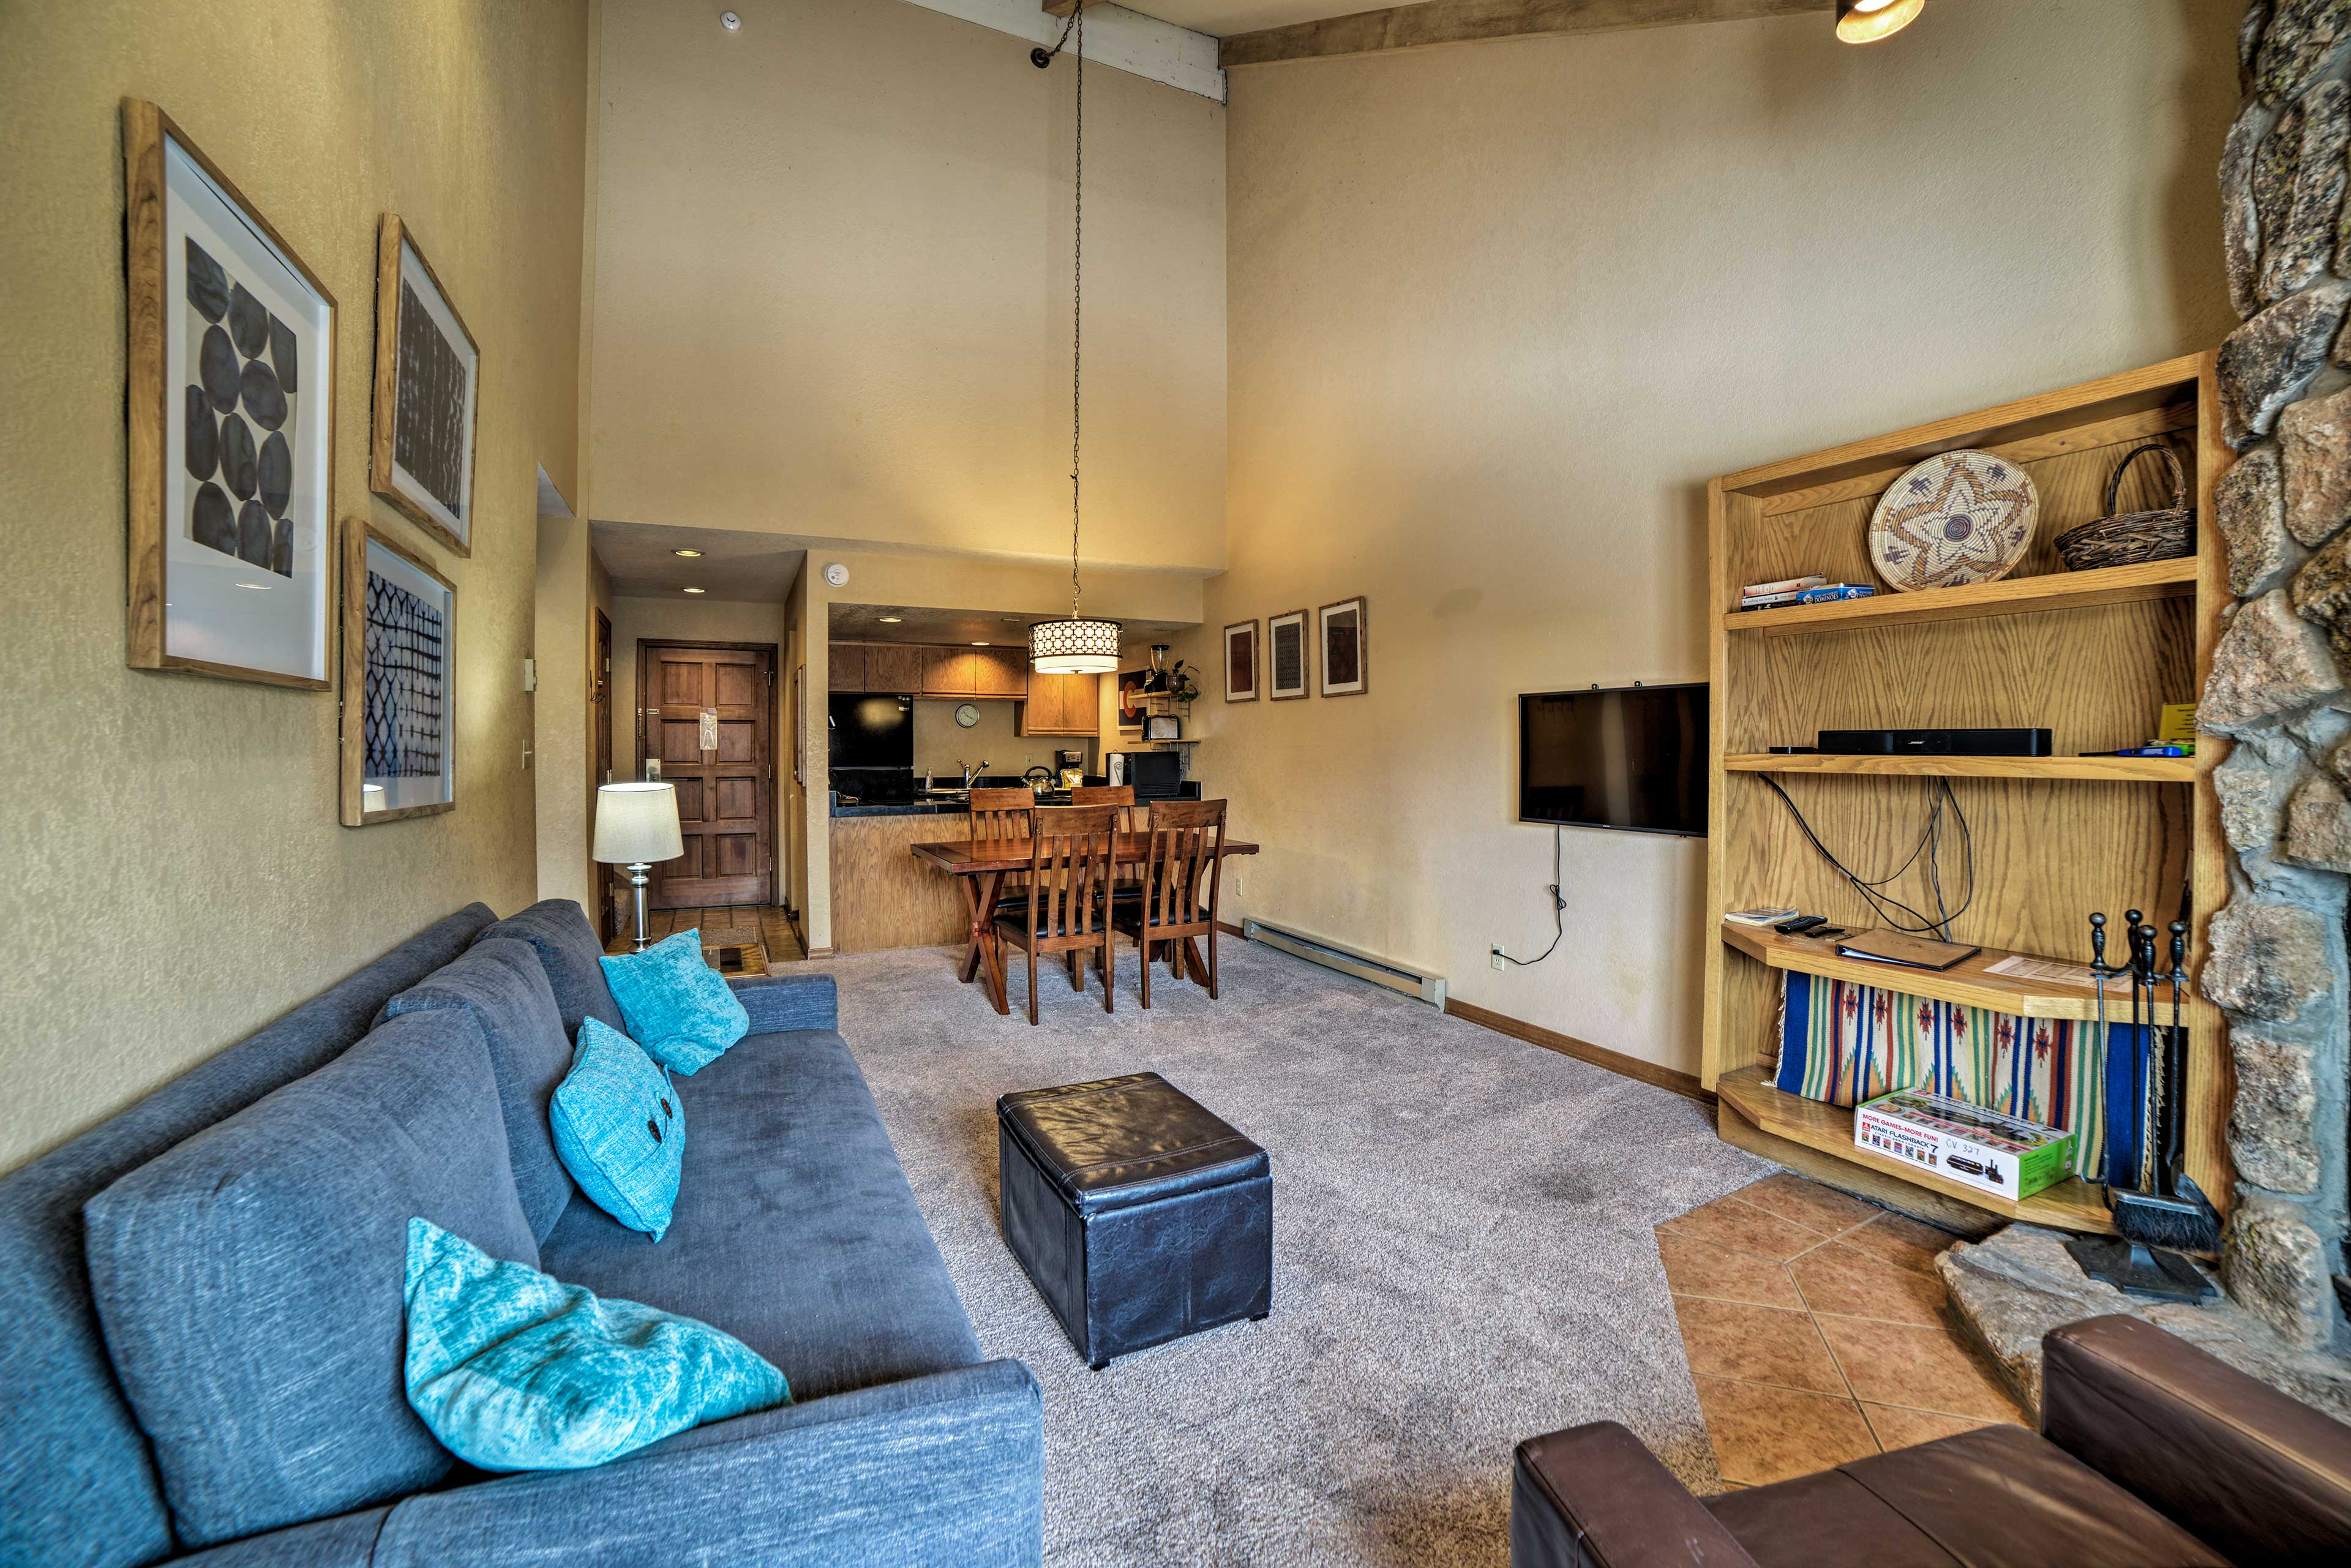 Living Room | Smart TV | Vaulted Ceilings